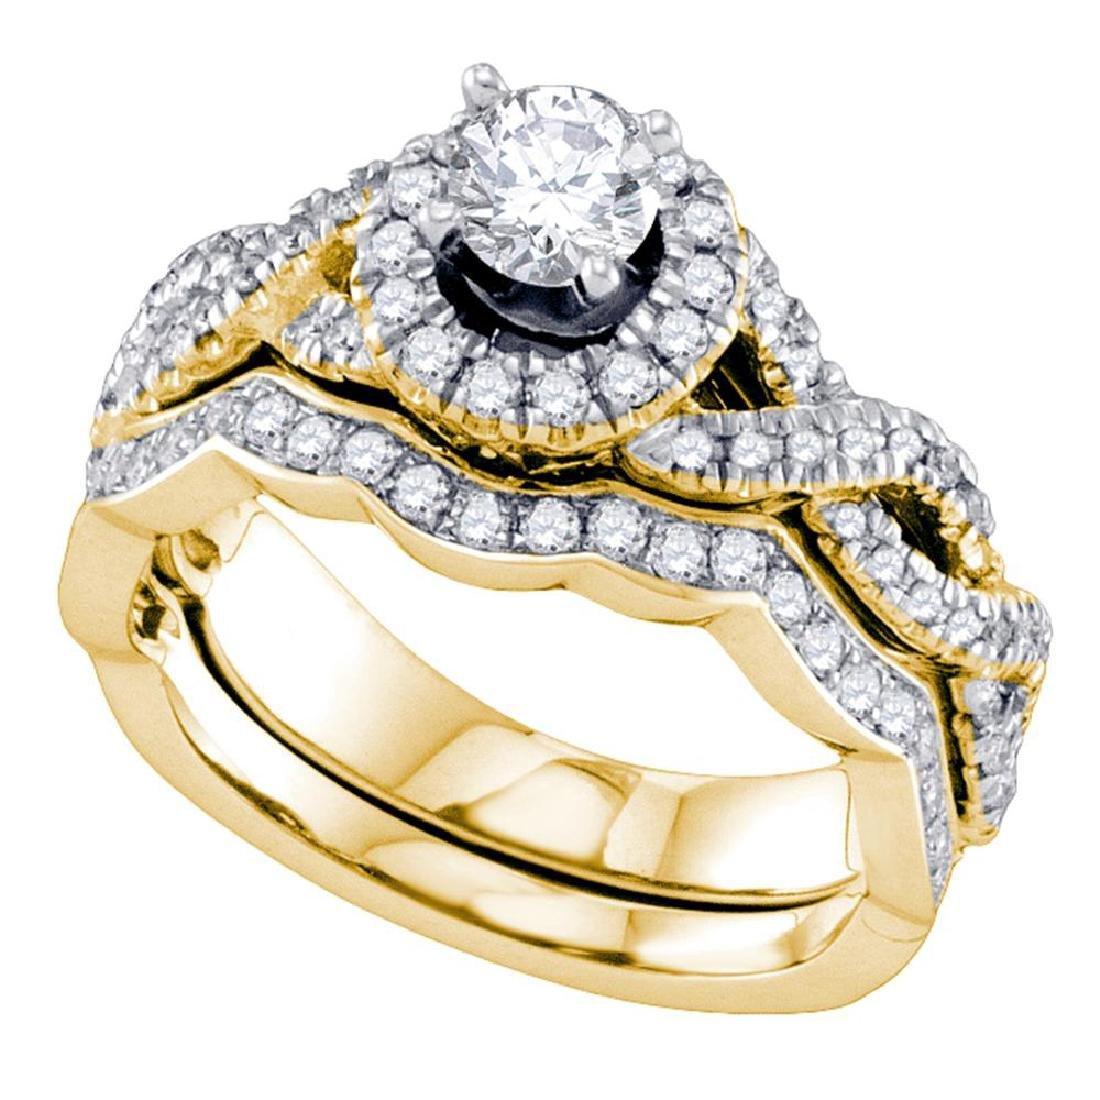 1 CTW Diamond Halo Bridal Wedding Engagement Ring 14KT